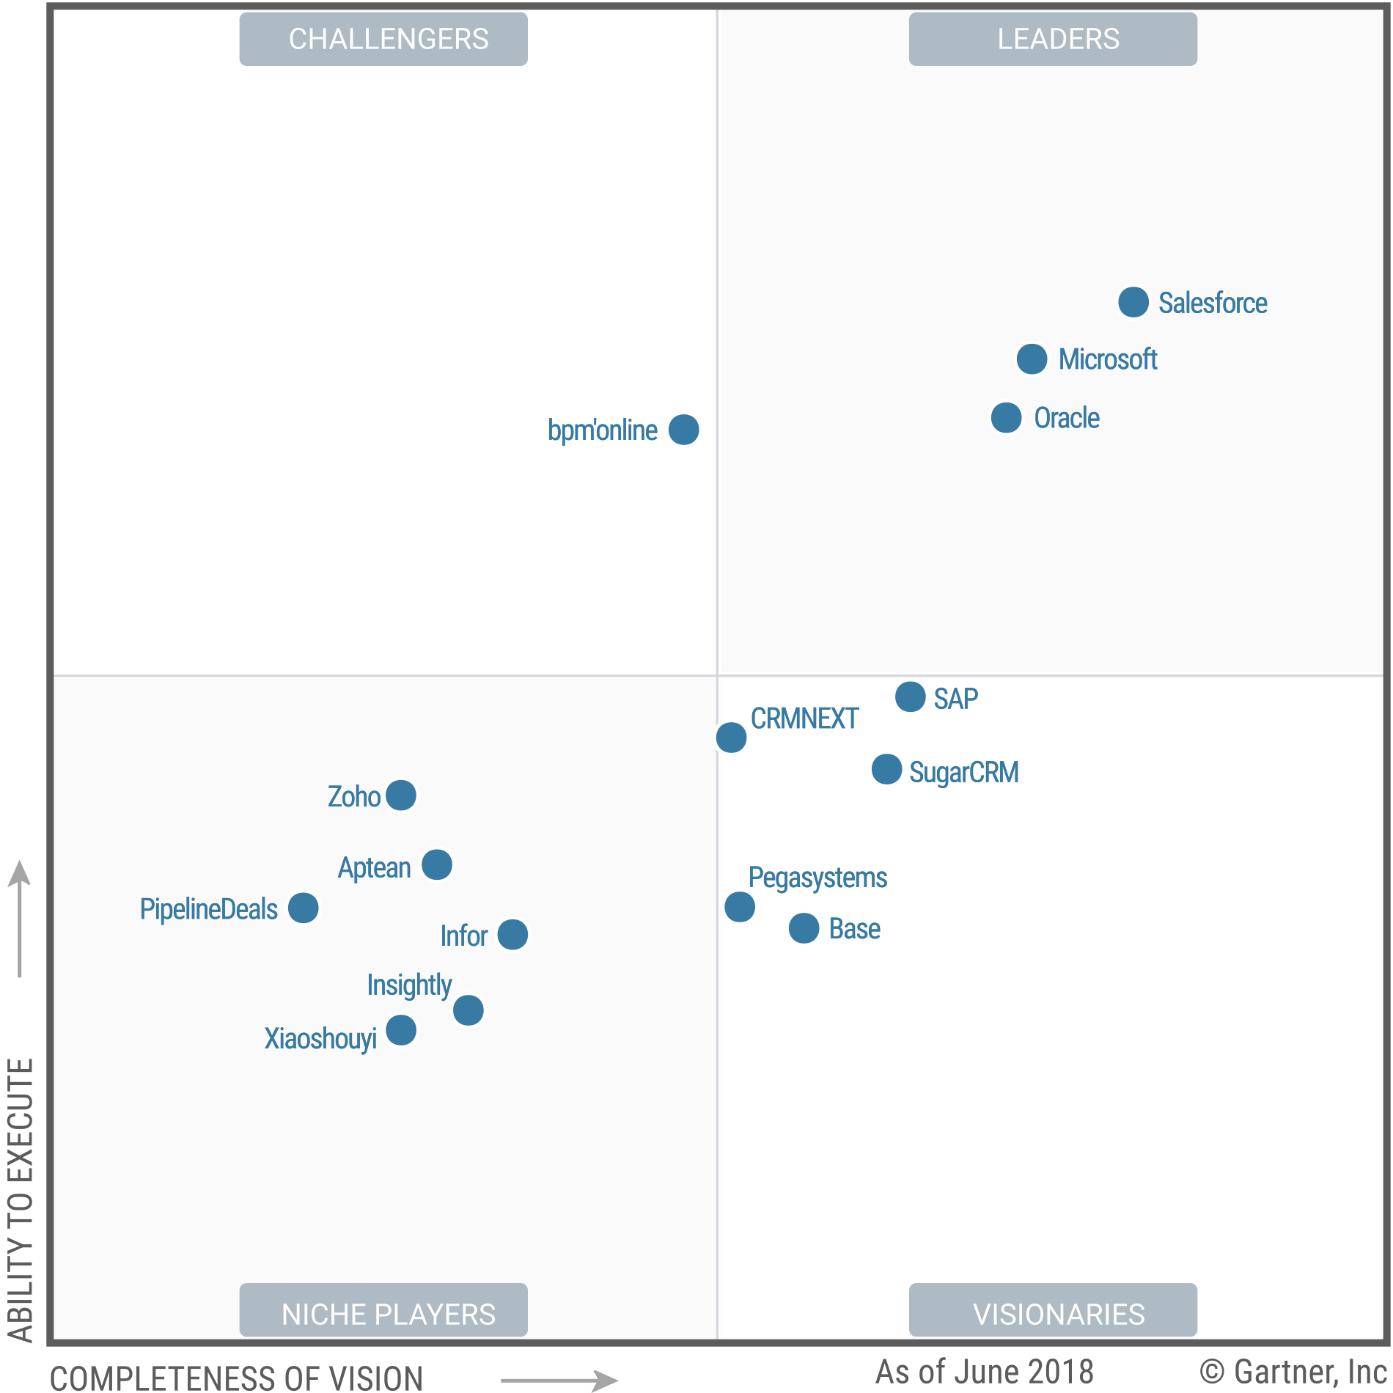 Gartner Magic Quadrant for Sales Force Automation 2018